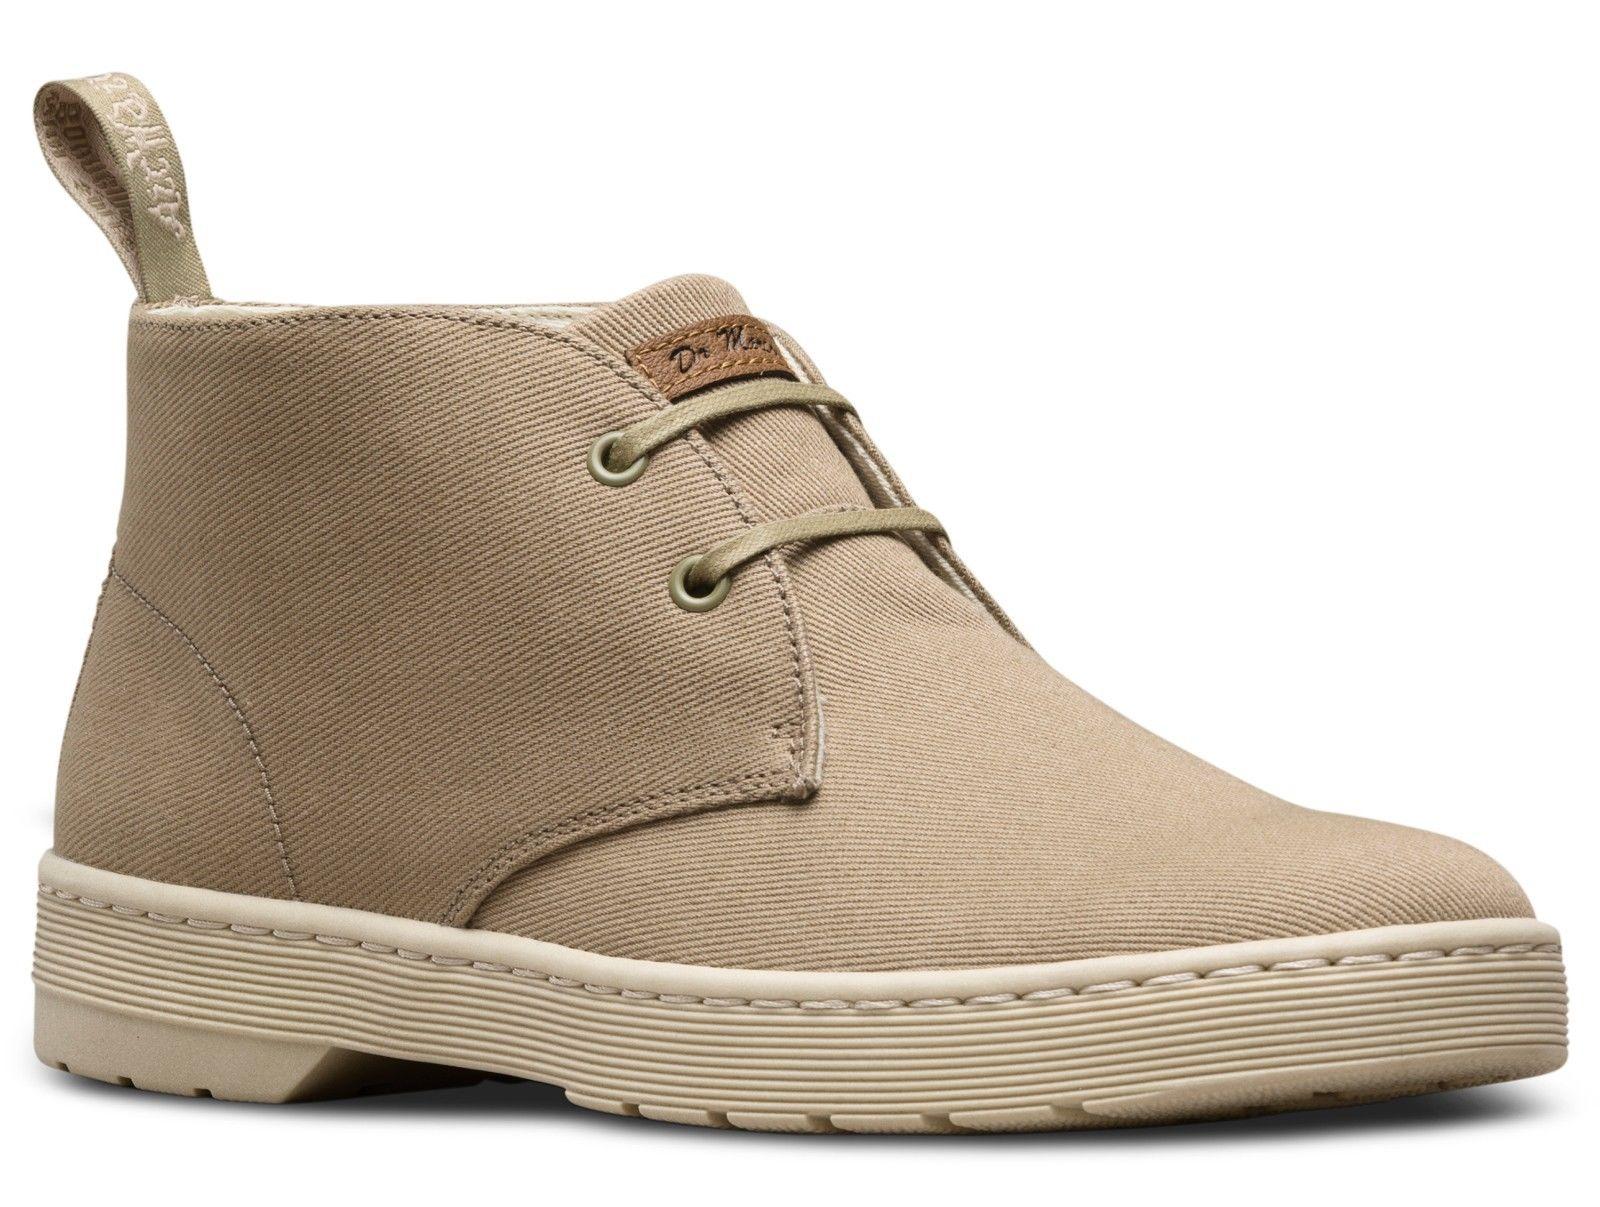 Dr Martens 23442353 Mayport desert olive Grau overdyed twill desert Mayport boot Größes 6-13UK a56fe1